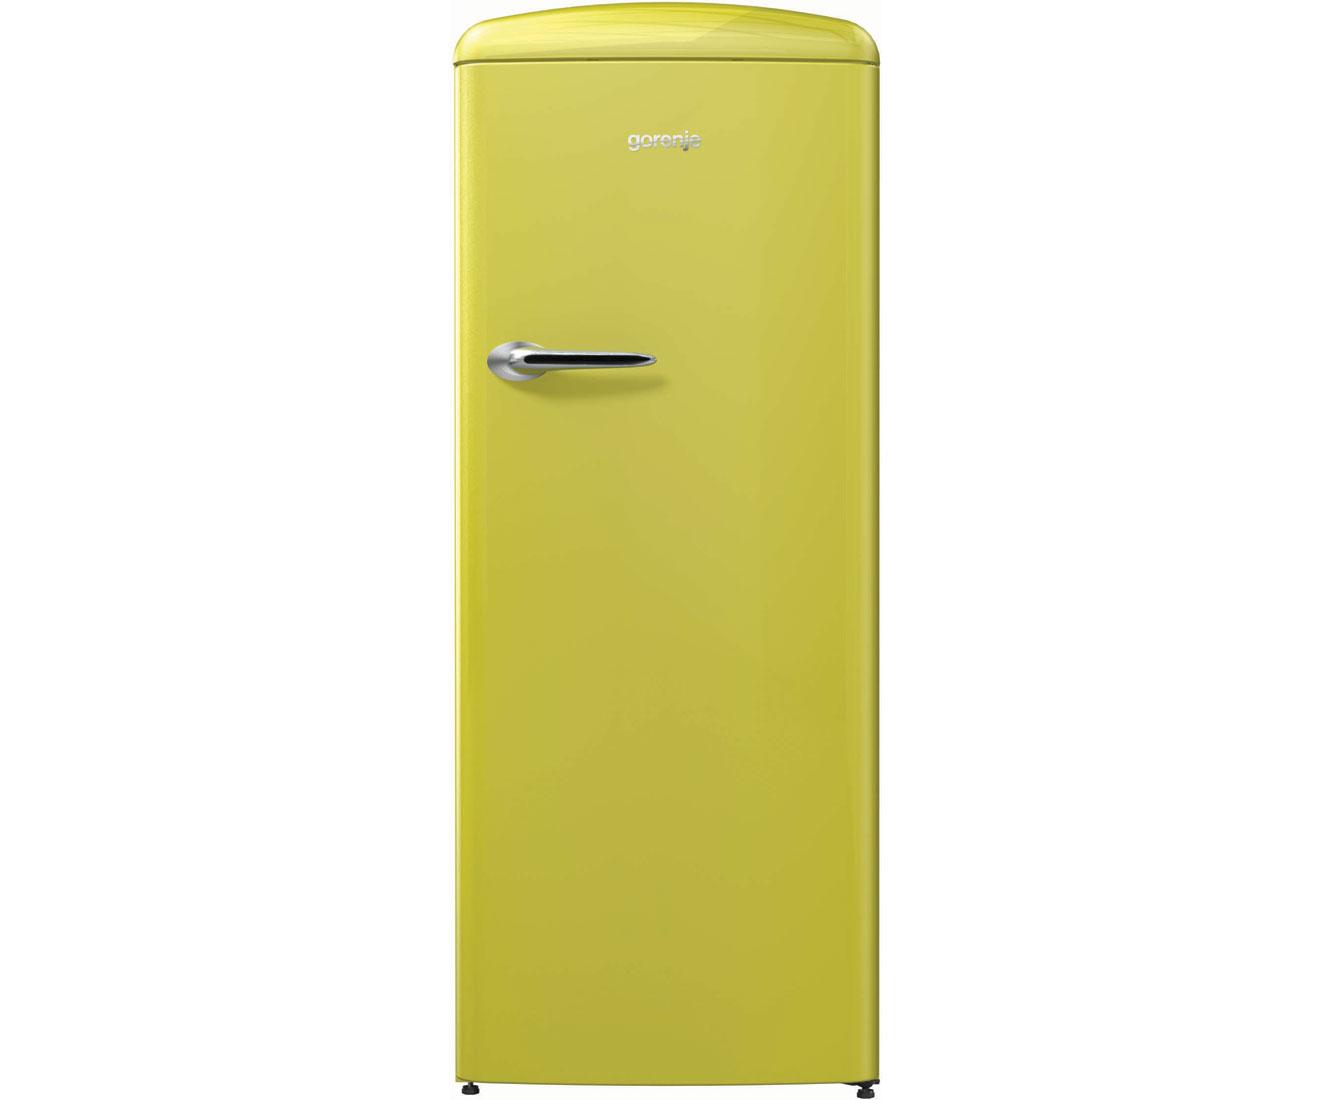 Gorenje Kühlschrank Ion Air : Gorenje orb ap kühlschrank oldtimer freistehend cm apfelgrün